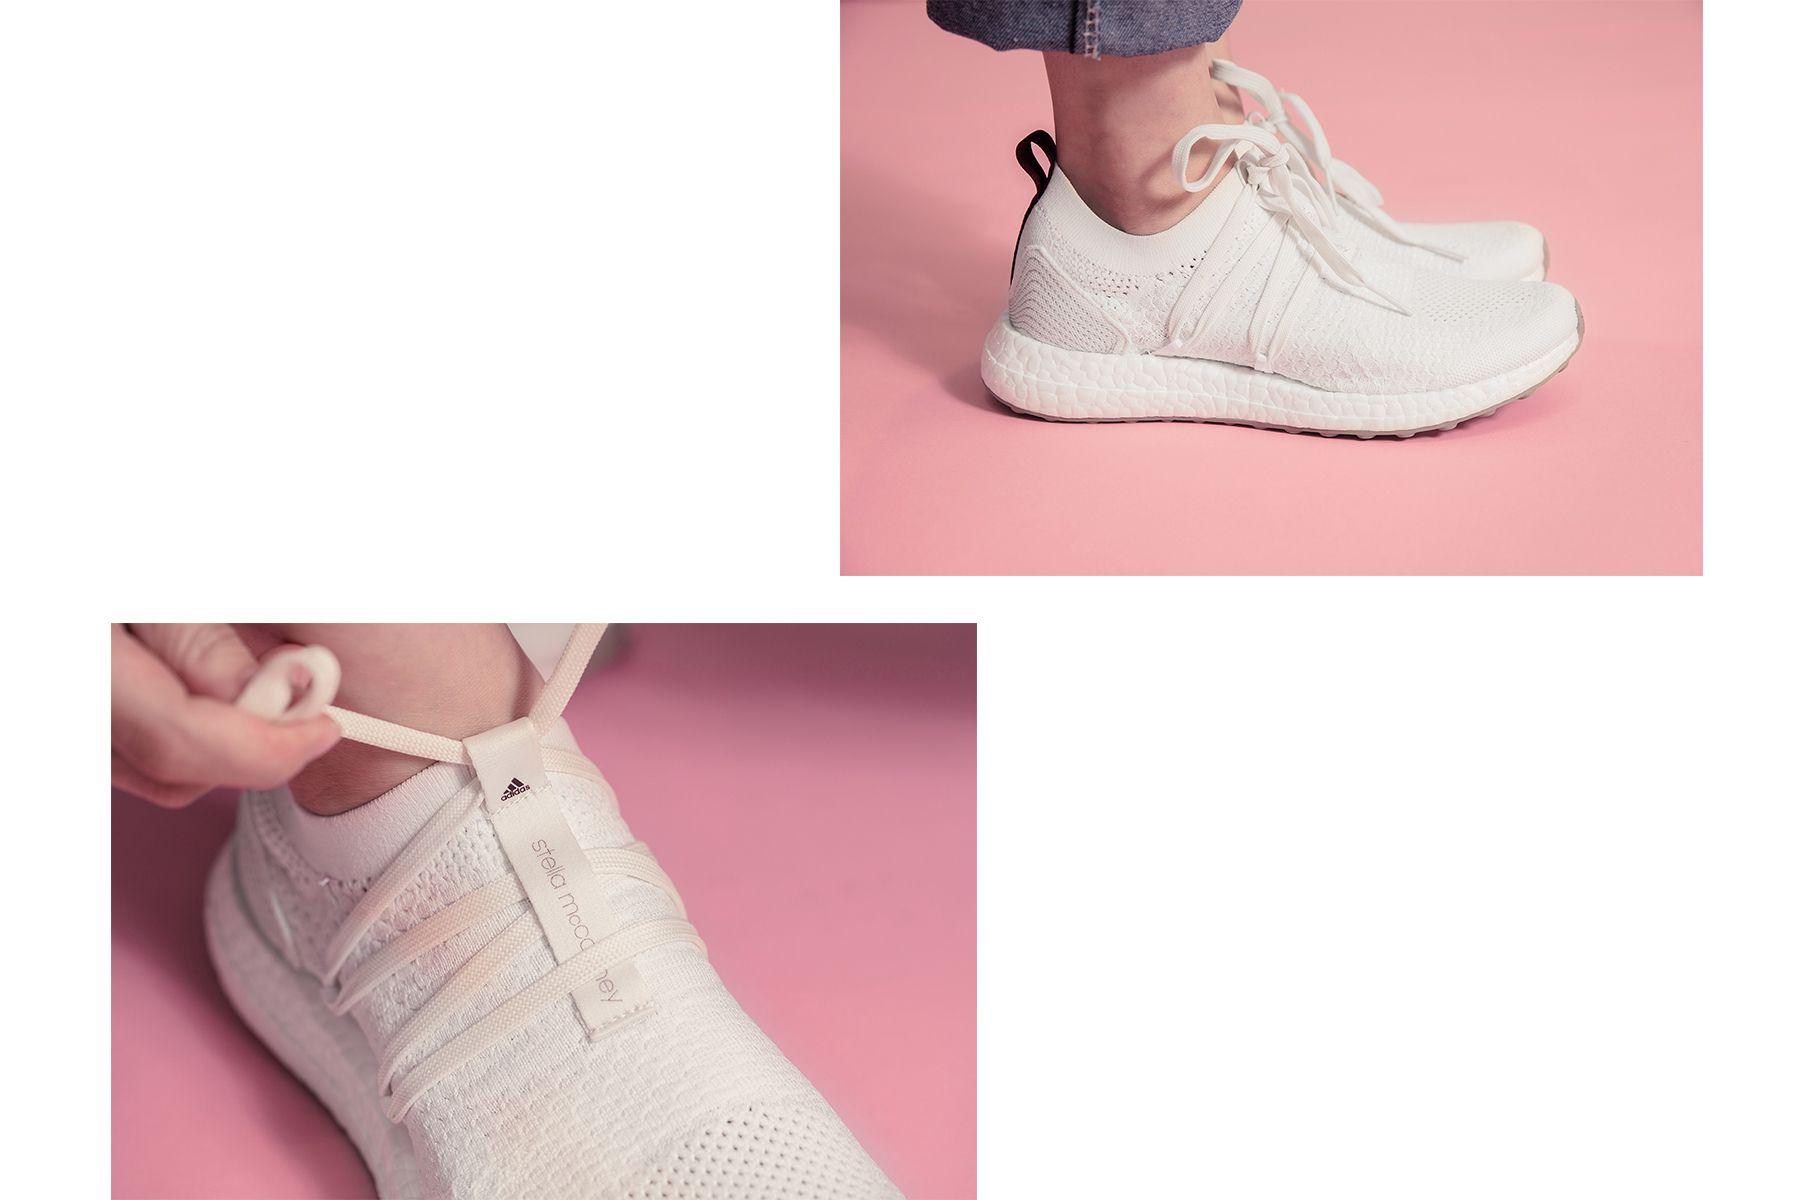 adidas by Stella McCartney Parley UltraBOOST X 2017 White